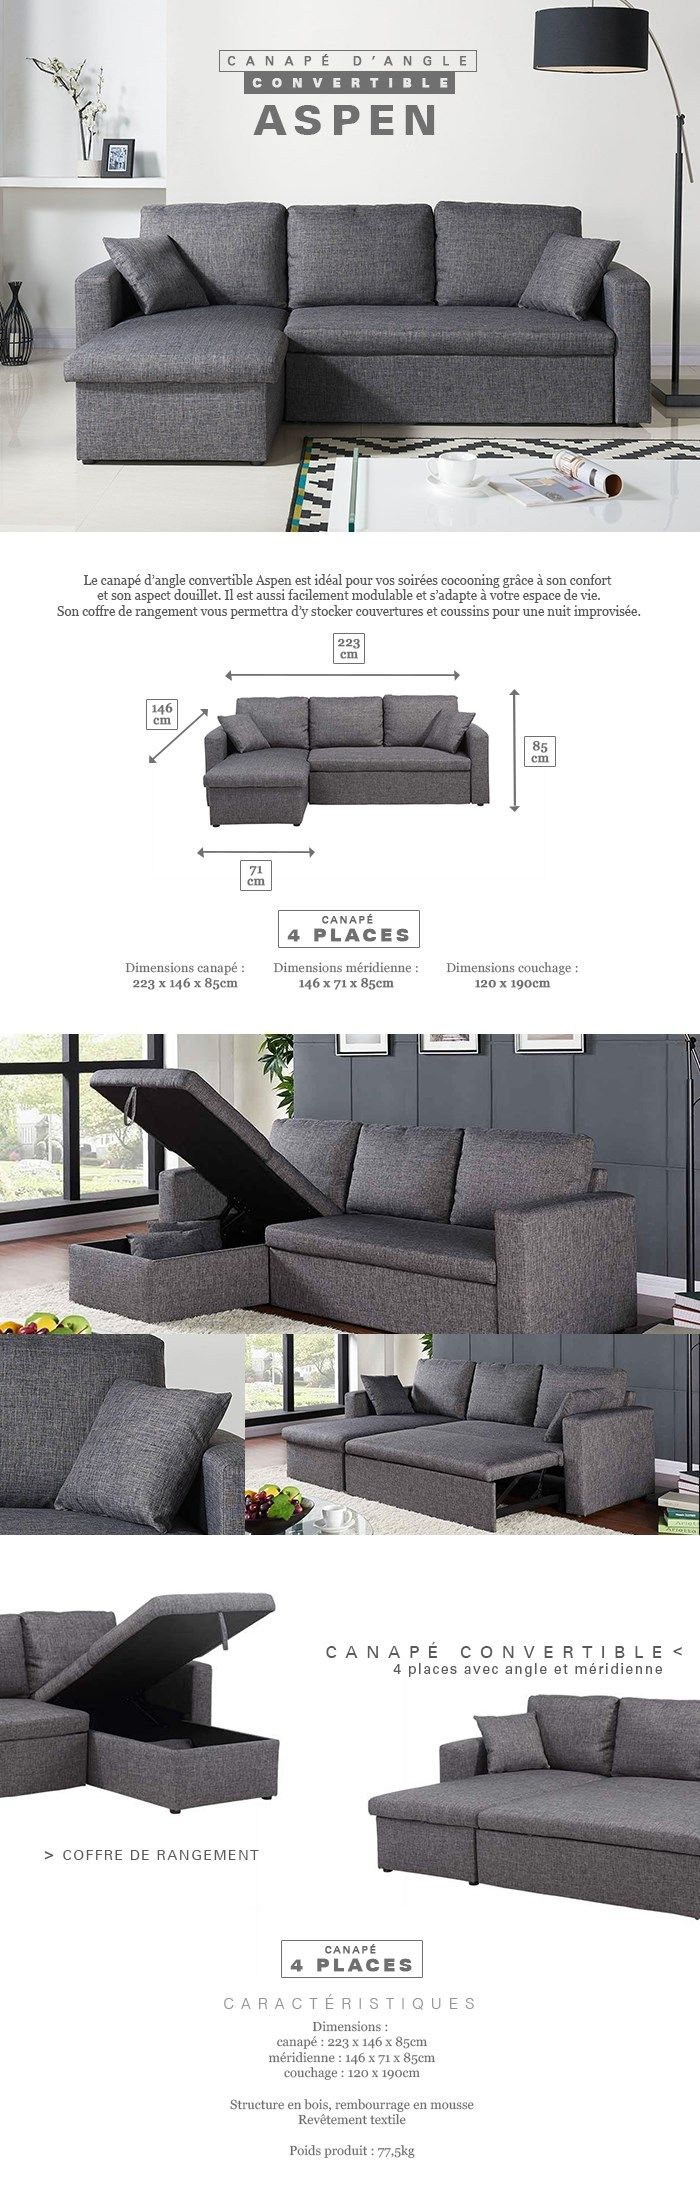 best 25 canape angle gris ideas on pinterest canap d 39 angle blanc canap d angle gris and. Black Bedroom Furniture Sets. Home Design Ideas